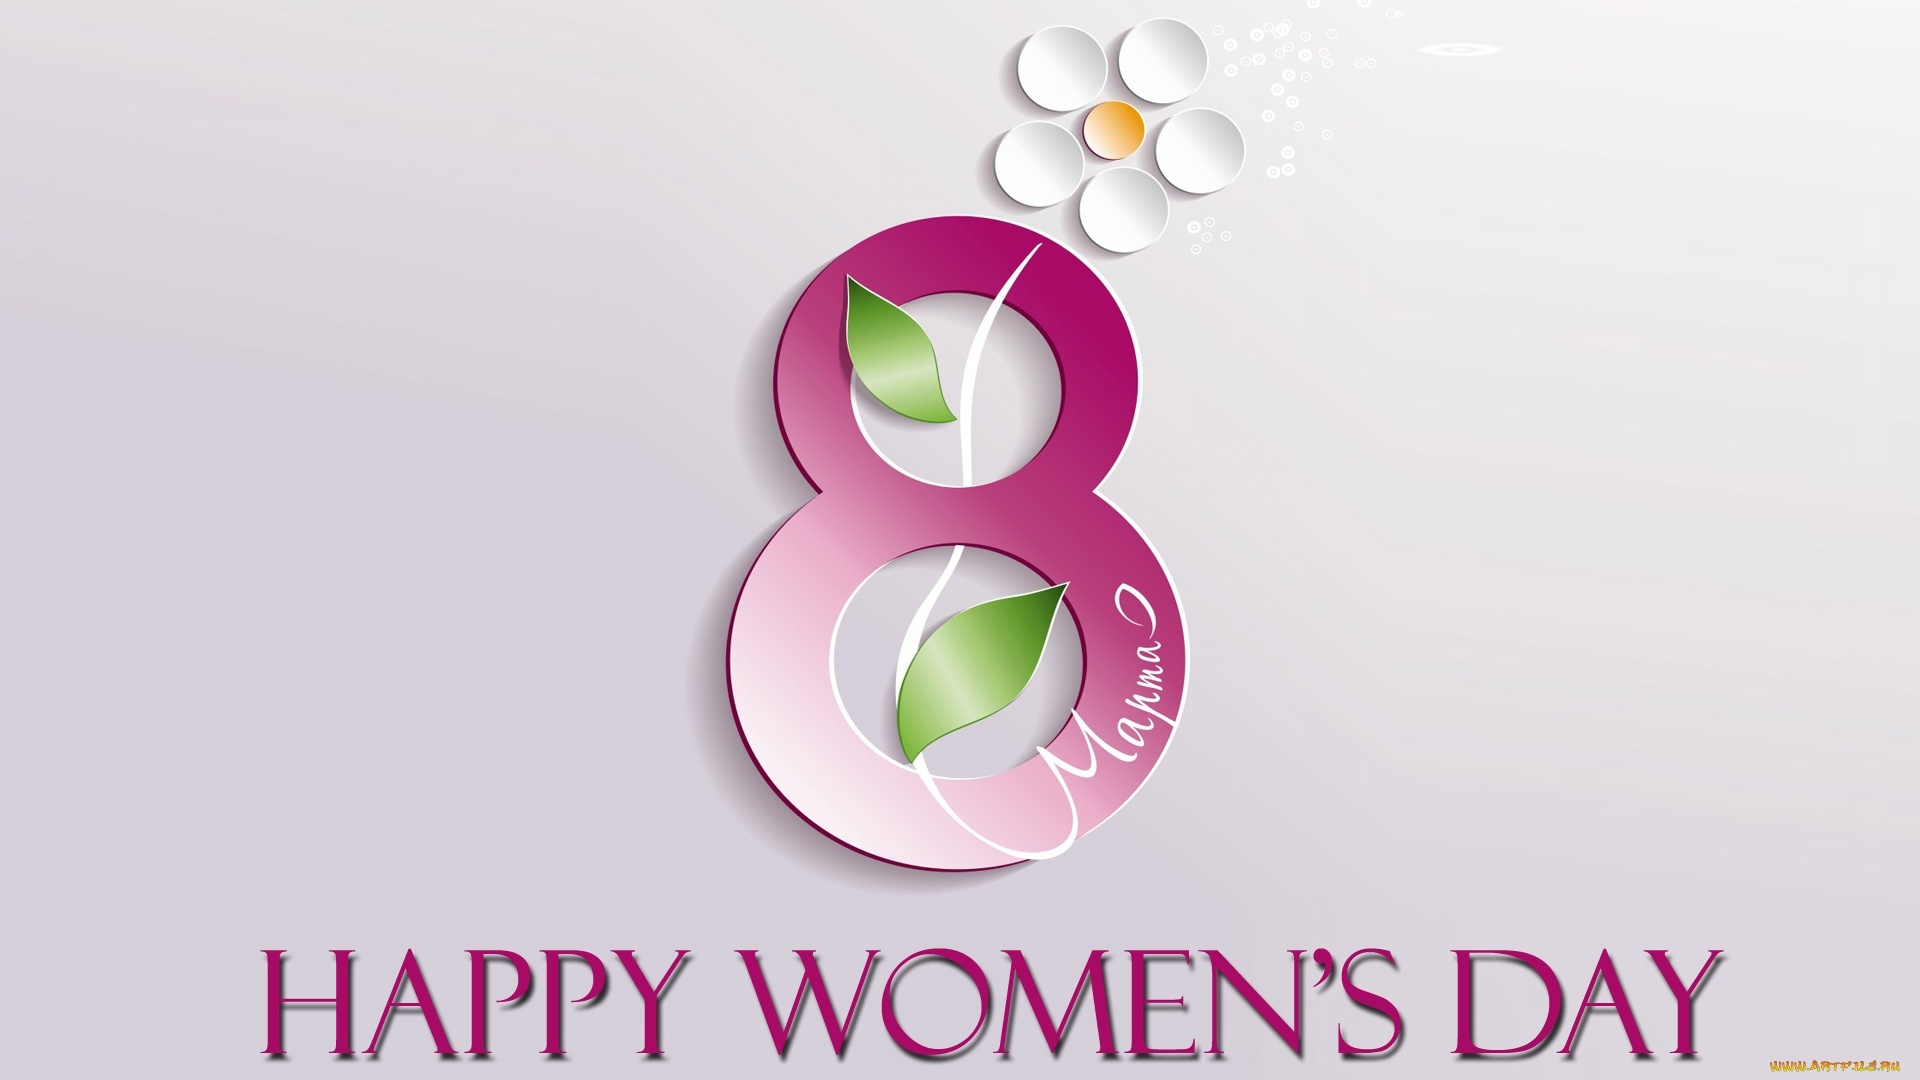 Happy Women's Day Background